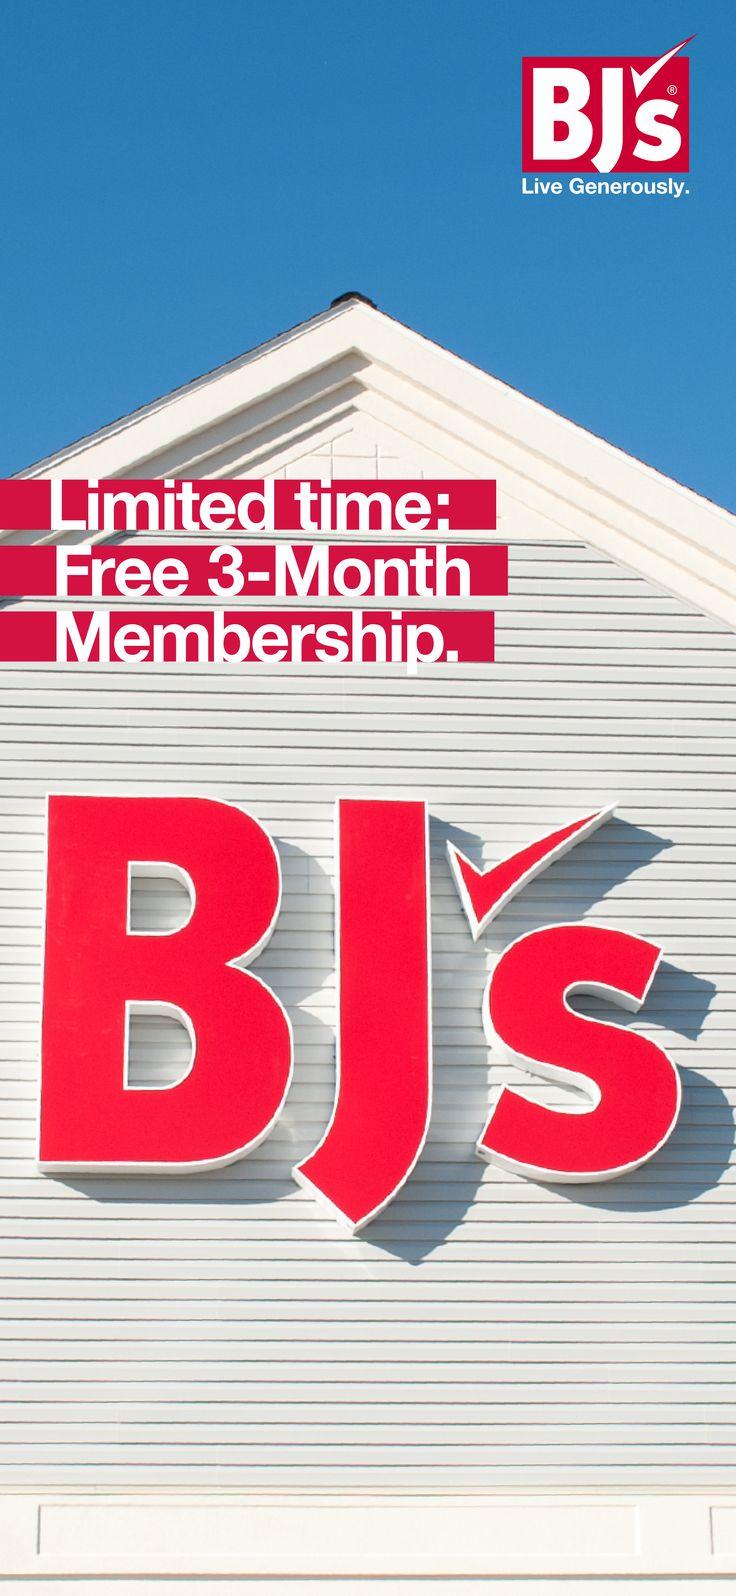 Sign up! Get a free 3-Month Membership now and save up to 25% off grocery store prices.    http://www.bjs.com/webapp/wcs/stores/servlet/PurchaseTrialMembership?storeId=10201&langId=-1&catalogId=10201&memberType=innercircle&isRewards=N&marketCode=ZK0417&cm_mmc=SpringMAP2017-_-SocialFulcrum-_-Pinterest-_-April&utm_source=Pinterest/&utm_medium=28.1P